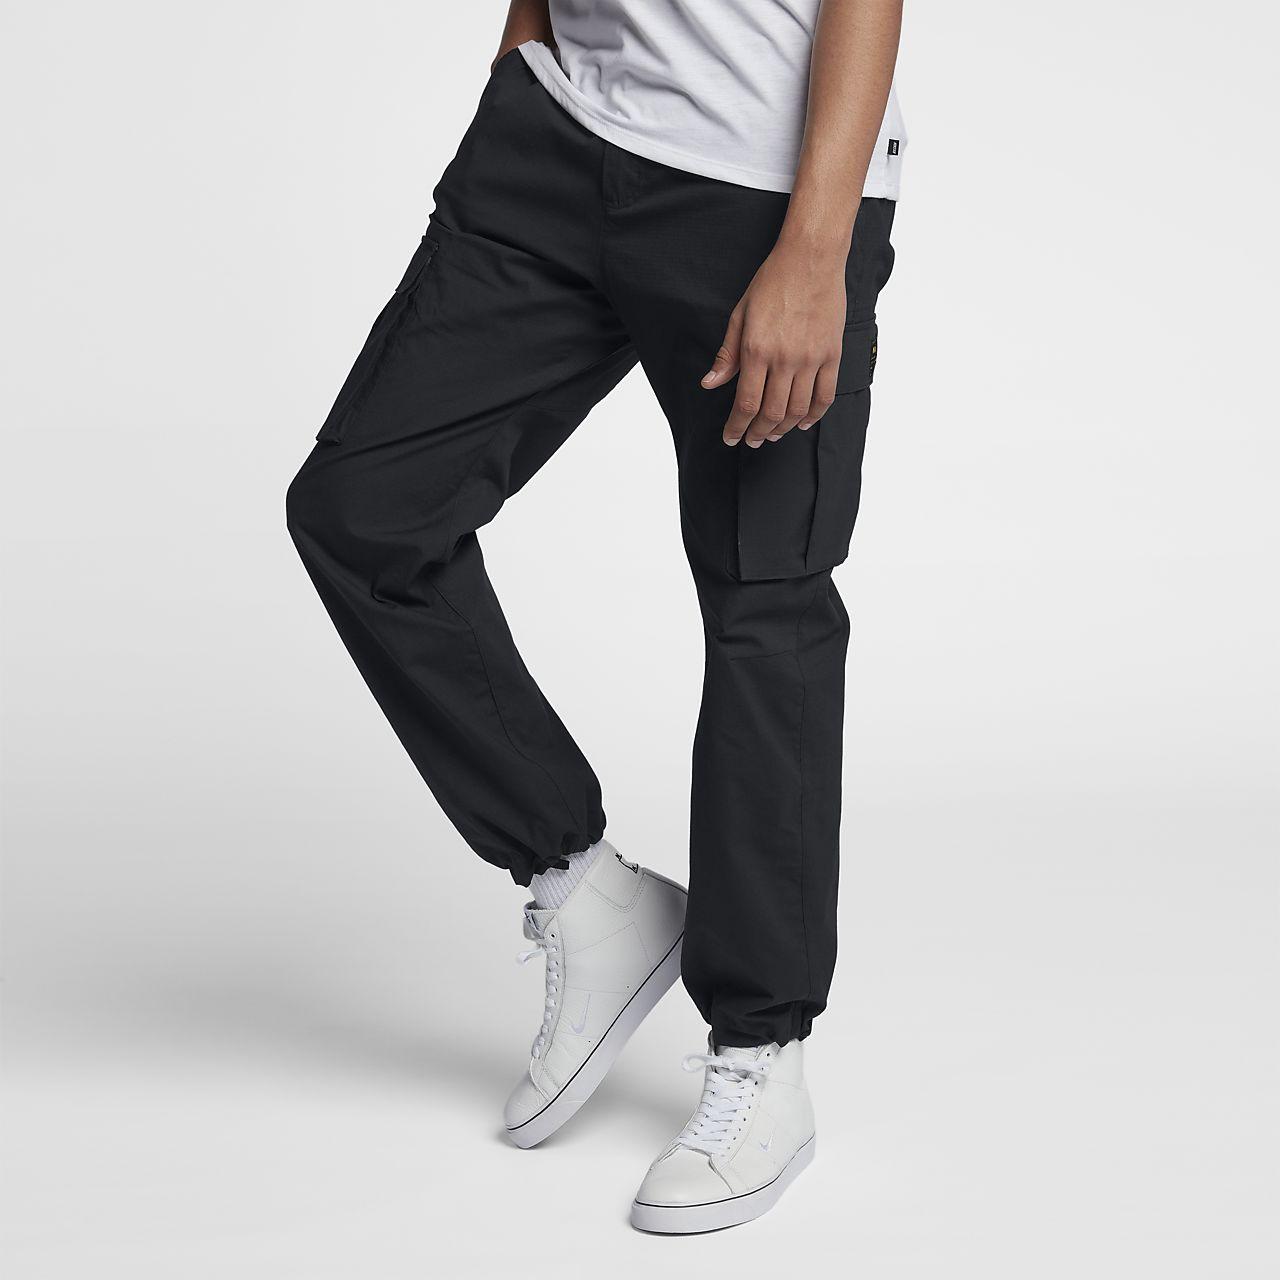 caa7ae0ad0 Nike SB Flex FTM Men's Skate Cargo Trousers. Nike.com NL